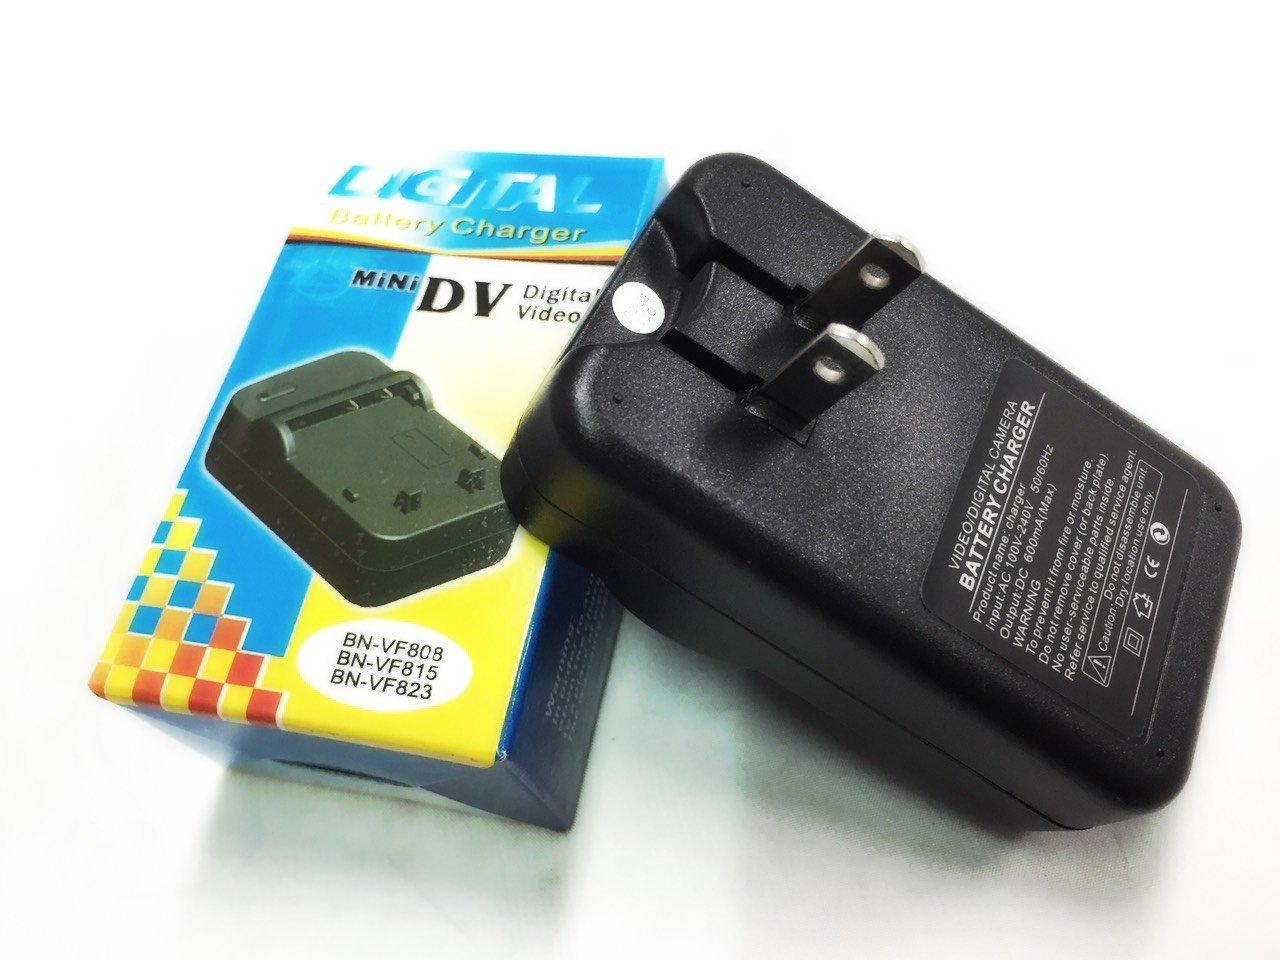 《阿玲》D-LI88 DLI88 充 Xacti VPC-CG10 DMX-CG10 VPC-CG11 CG110